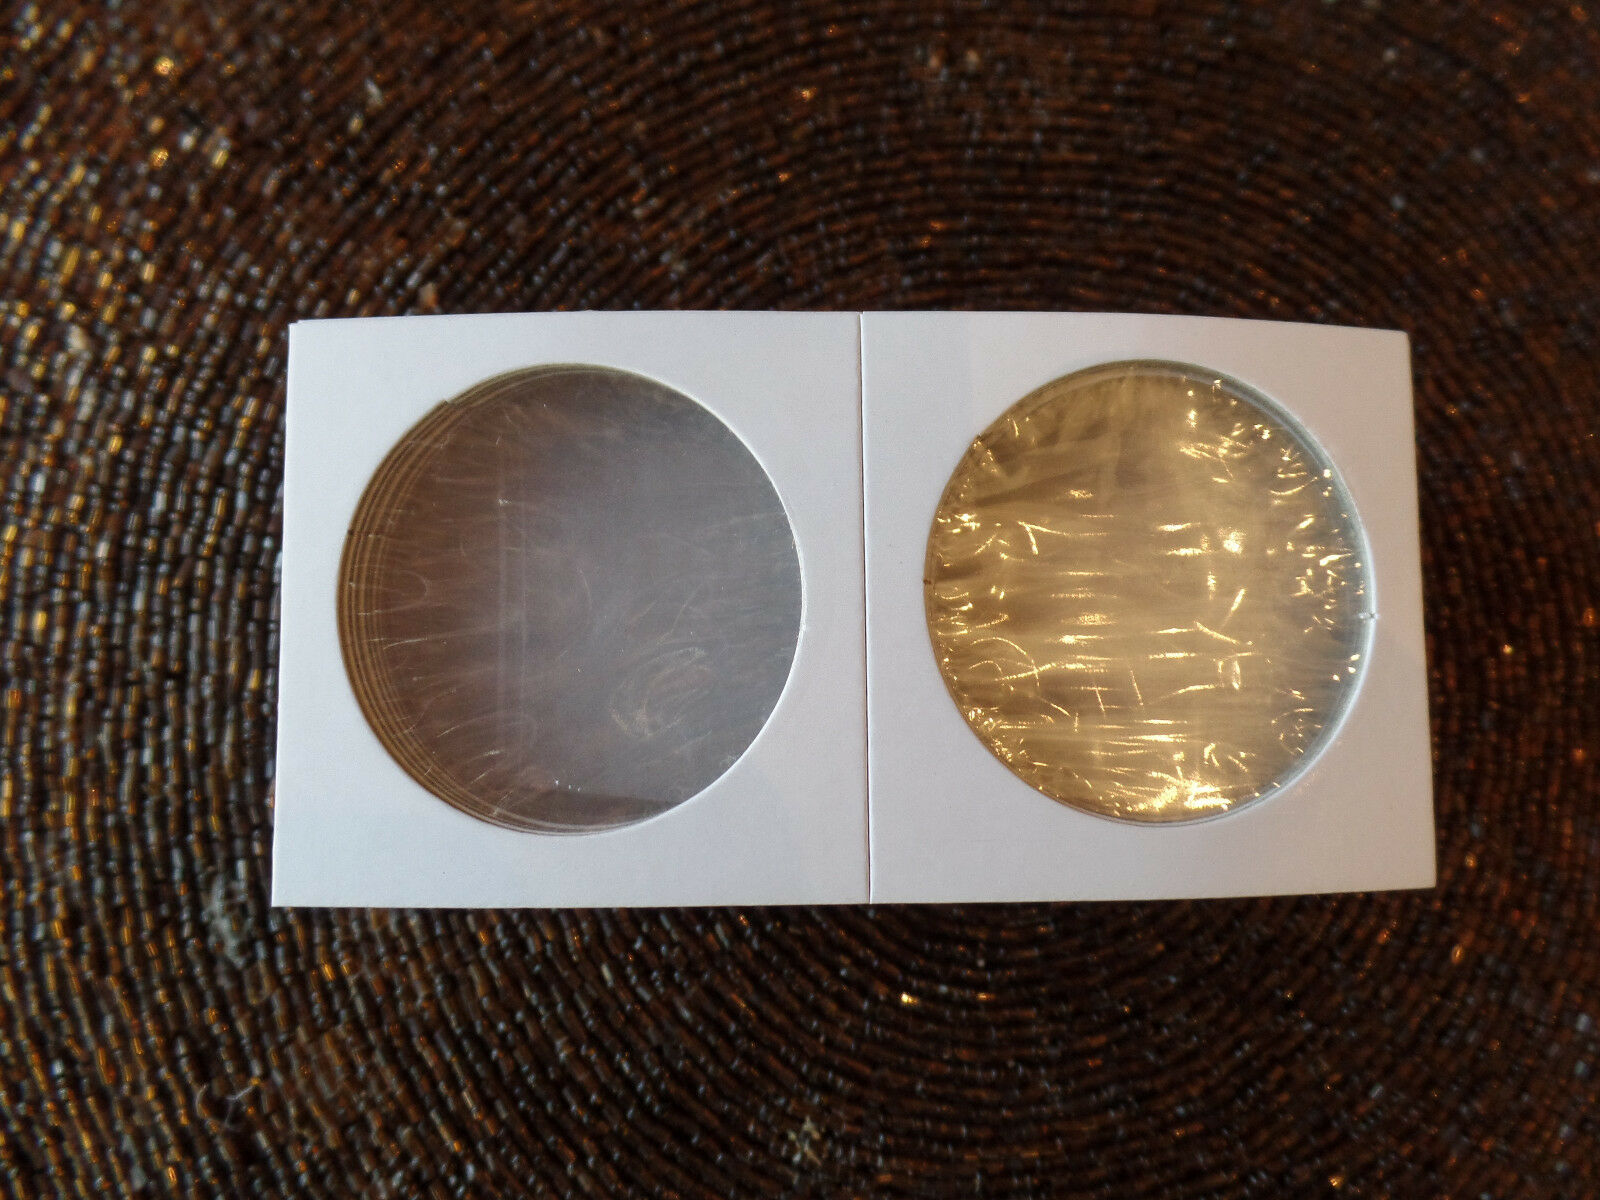 1000 2x2 new cardboard assortment coin holder flips with an bonus option offered